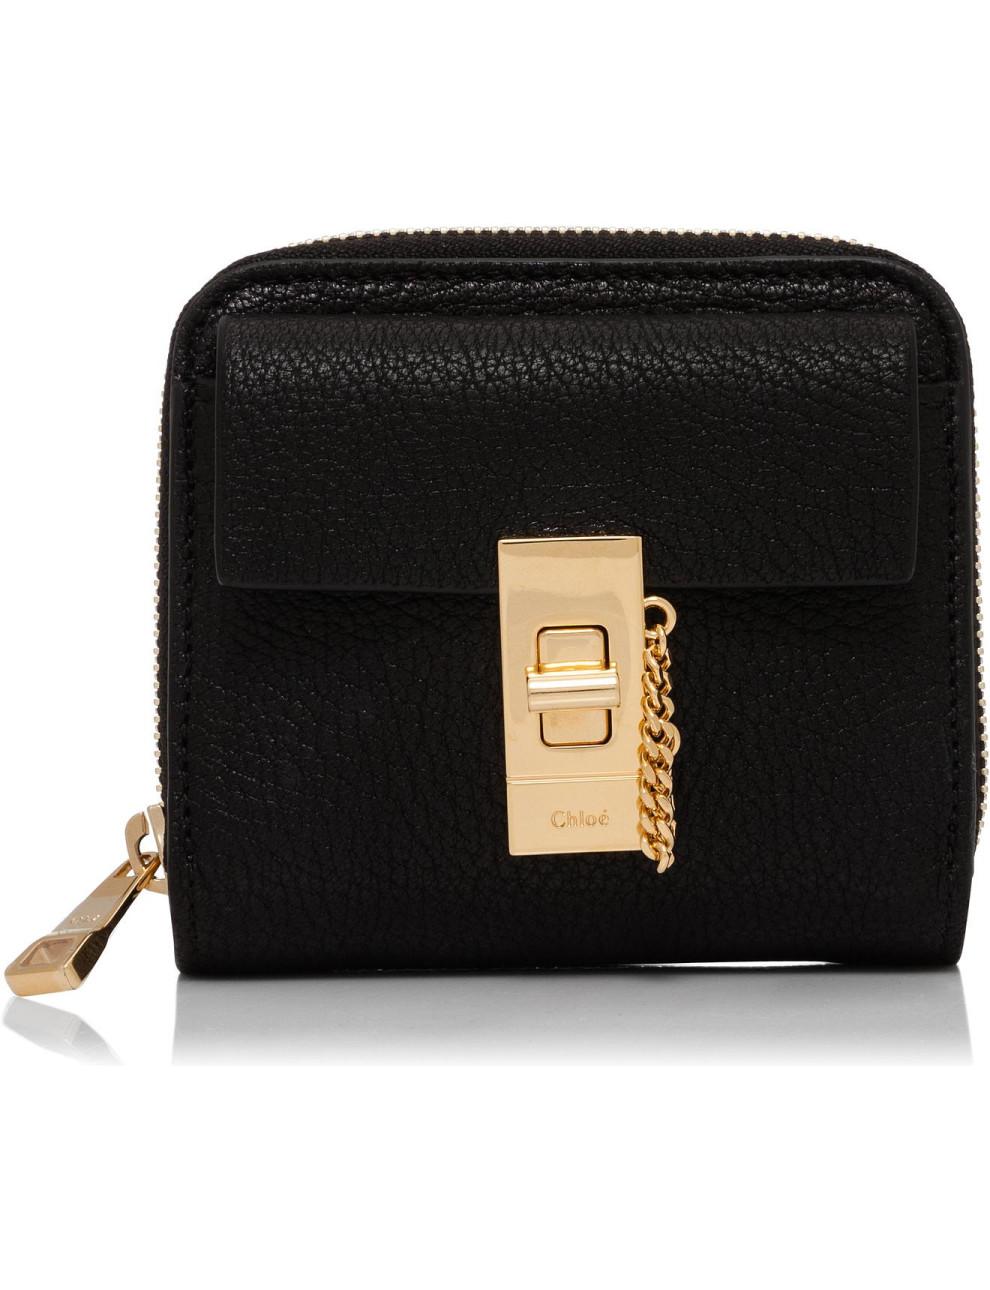 chloe wallets and purses